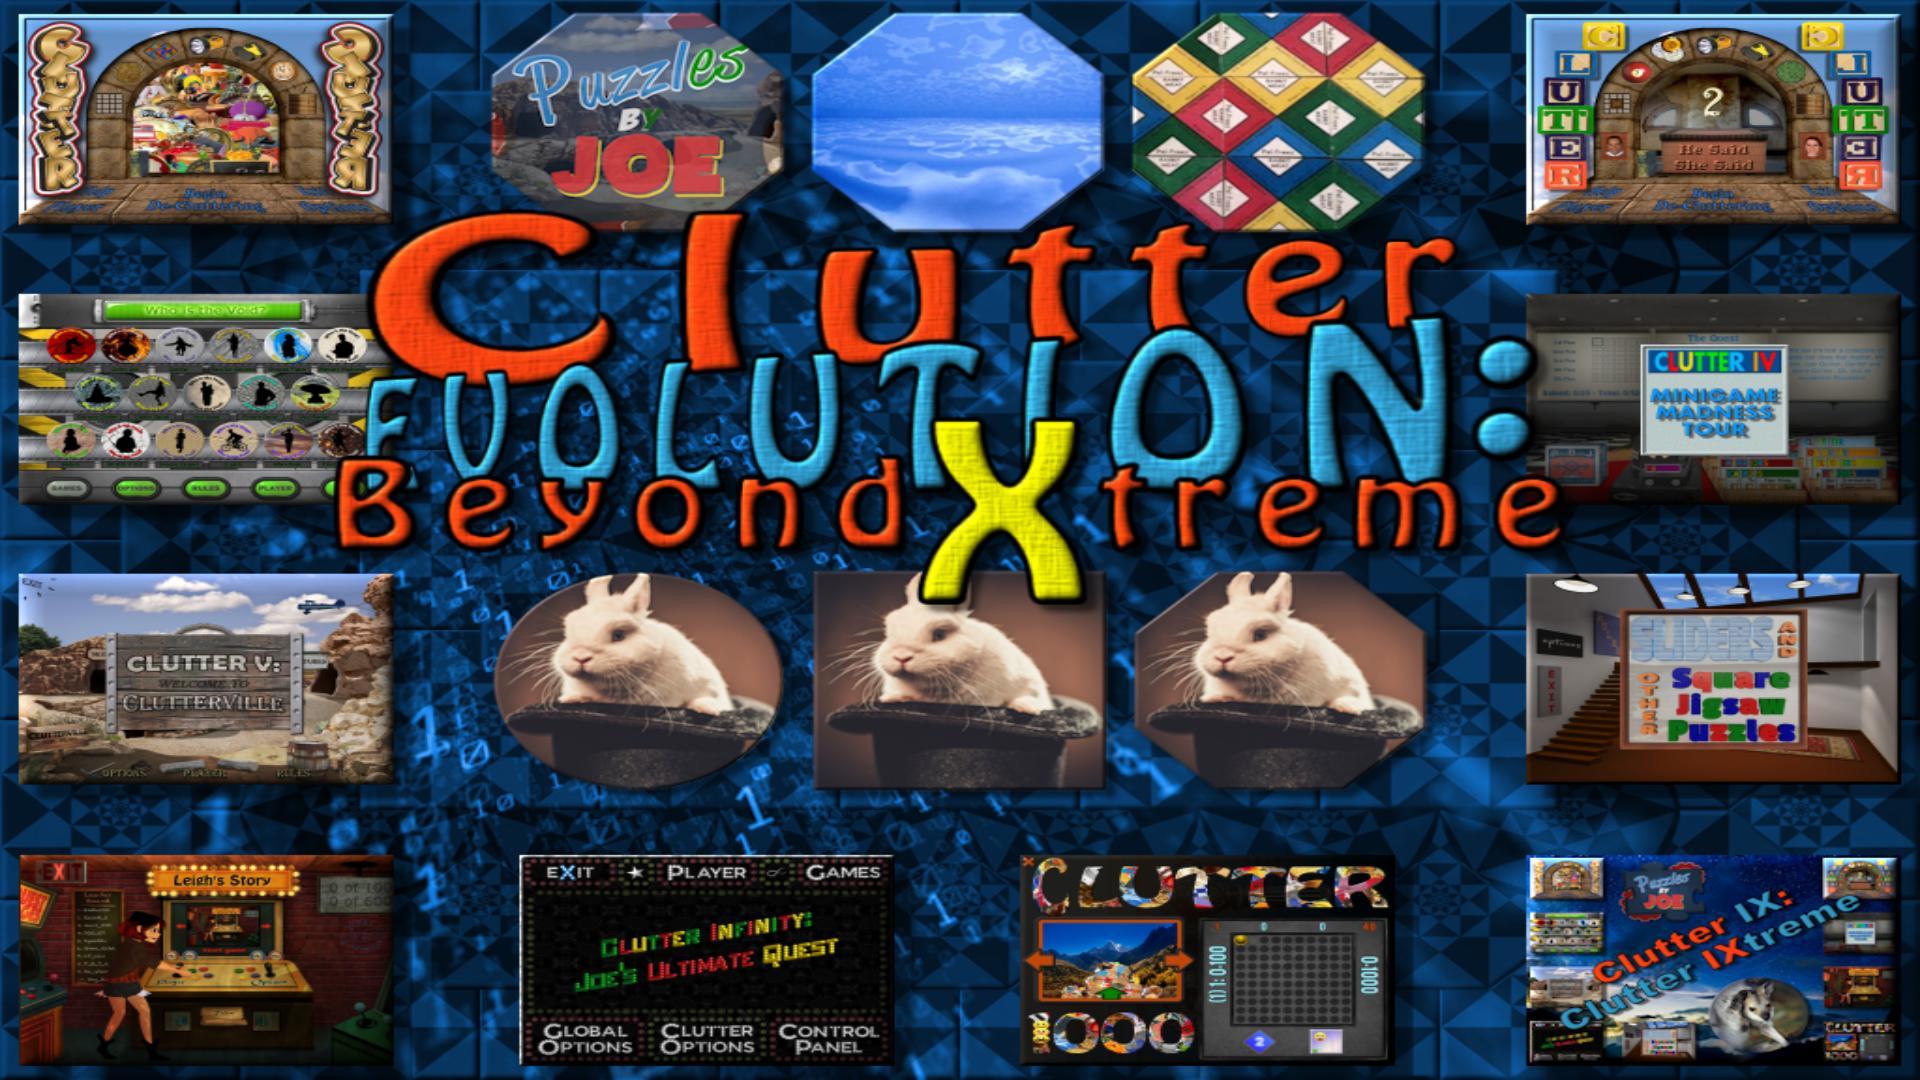 Эволюция беспорядка: По ту сторону экстрима | Clutter Evolution: Beyond Xtreme (En)